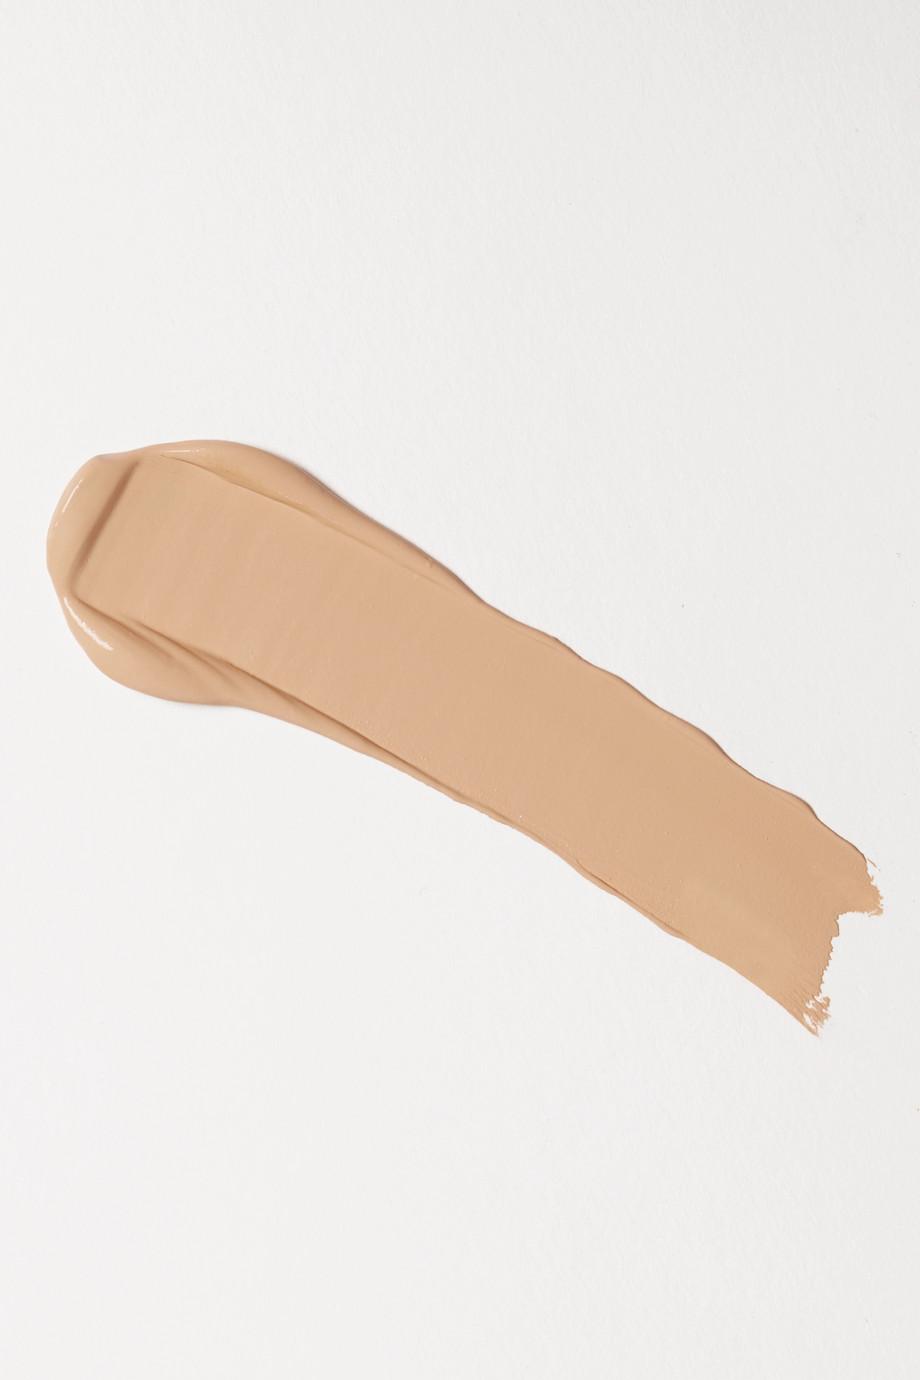 NARS Radiant Creamy Concealer - Nougatine, 6ml